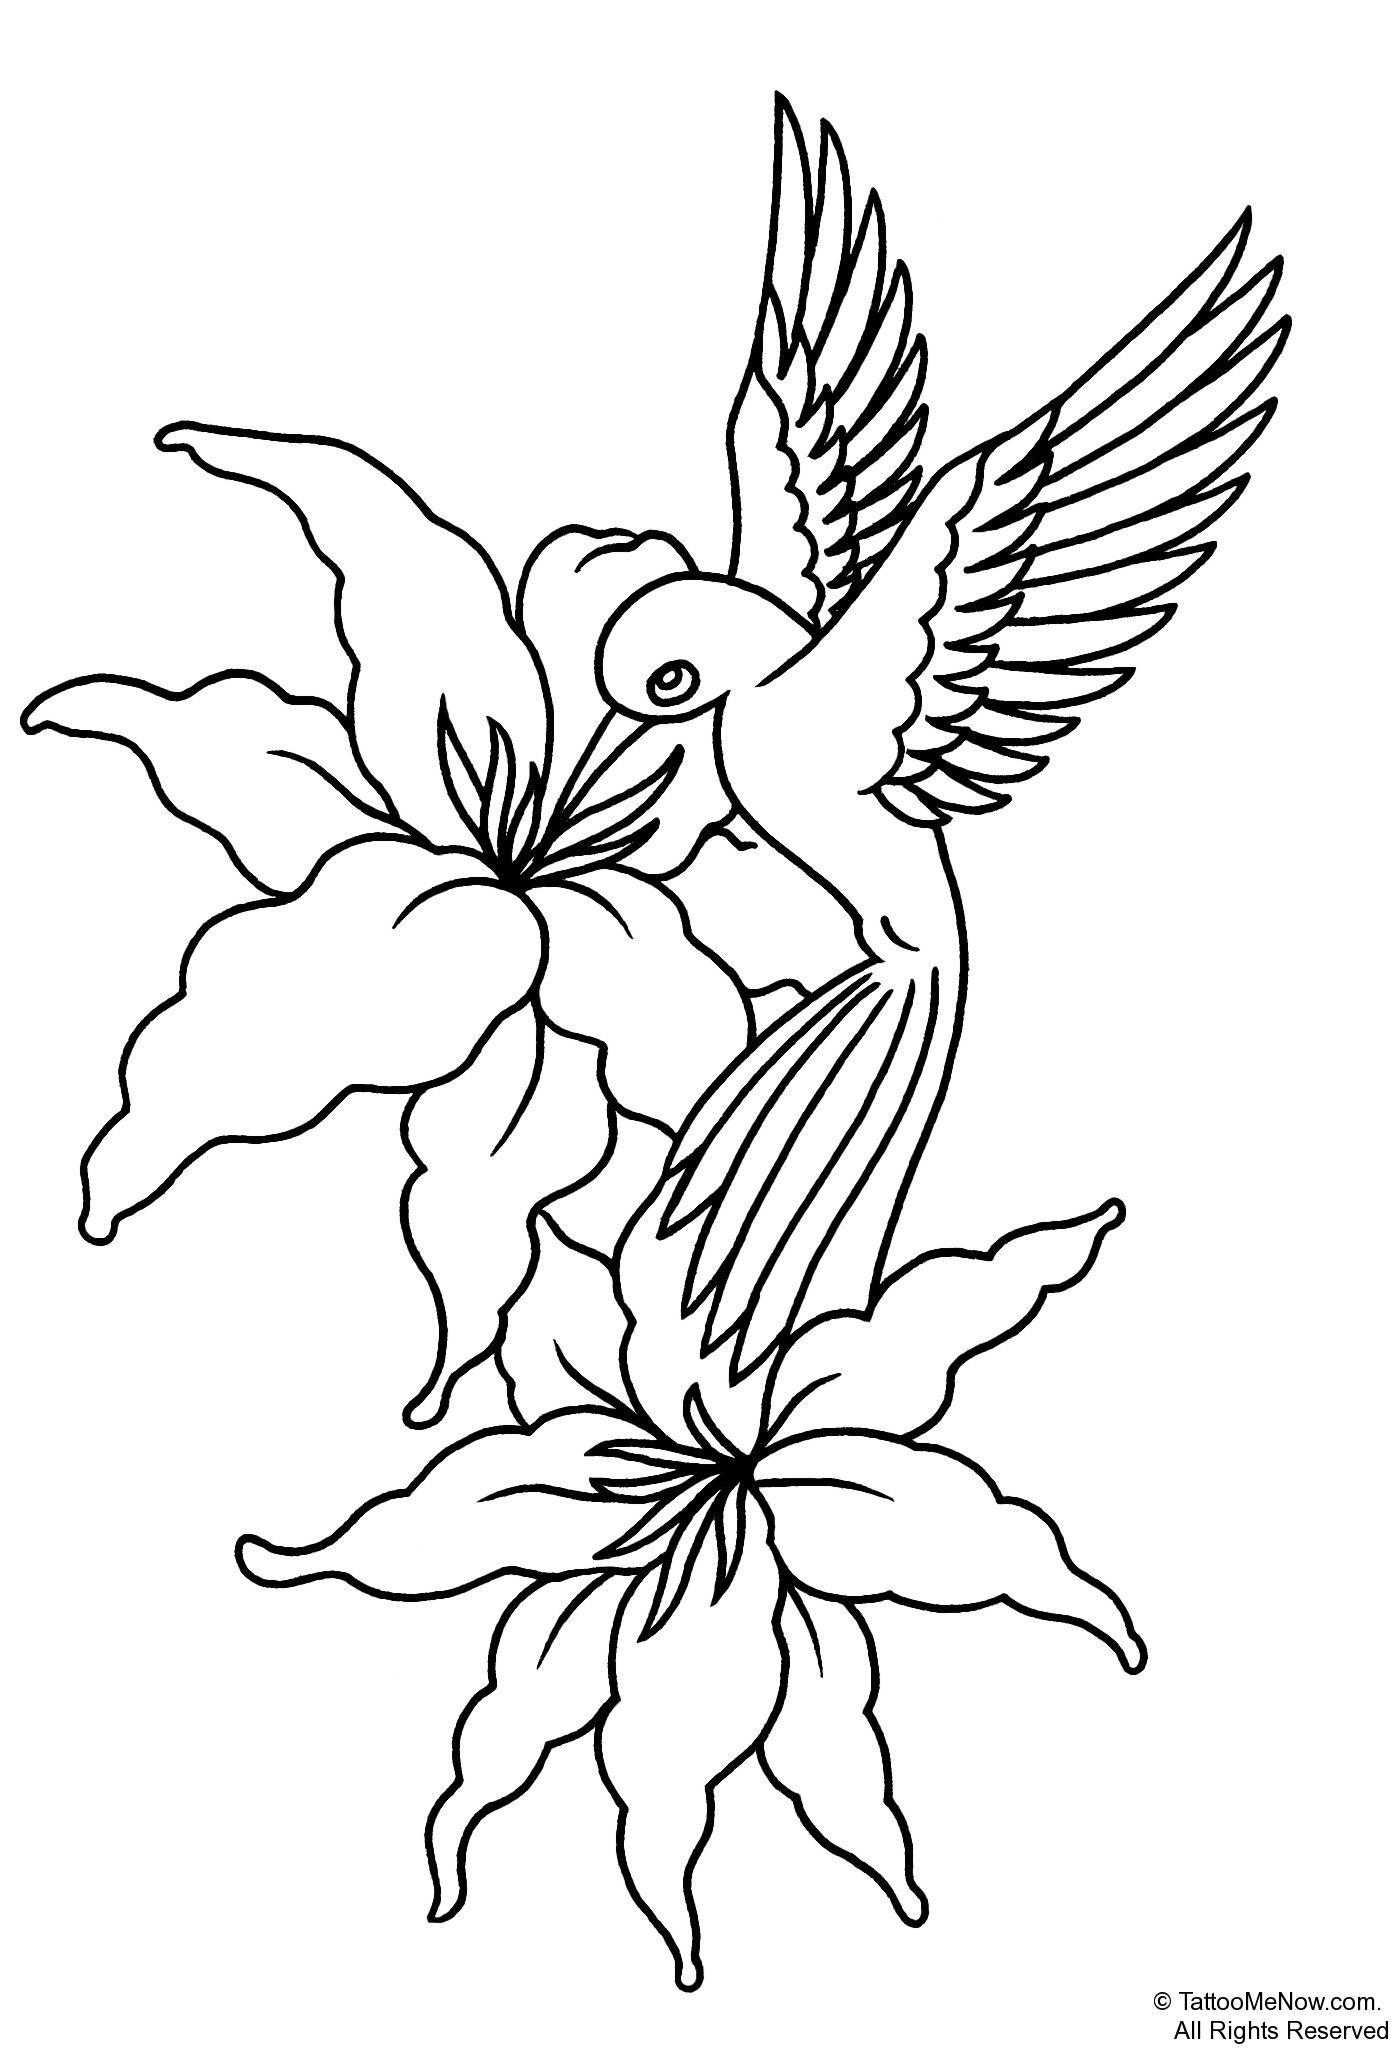 Free Printable Tattoo Stencils | Your Free Tattoo Designs & Stencils - Free Tattoo Stencils Printable